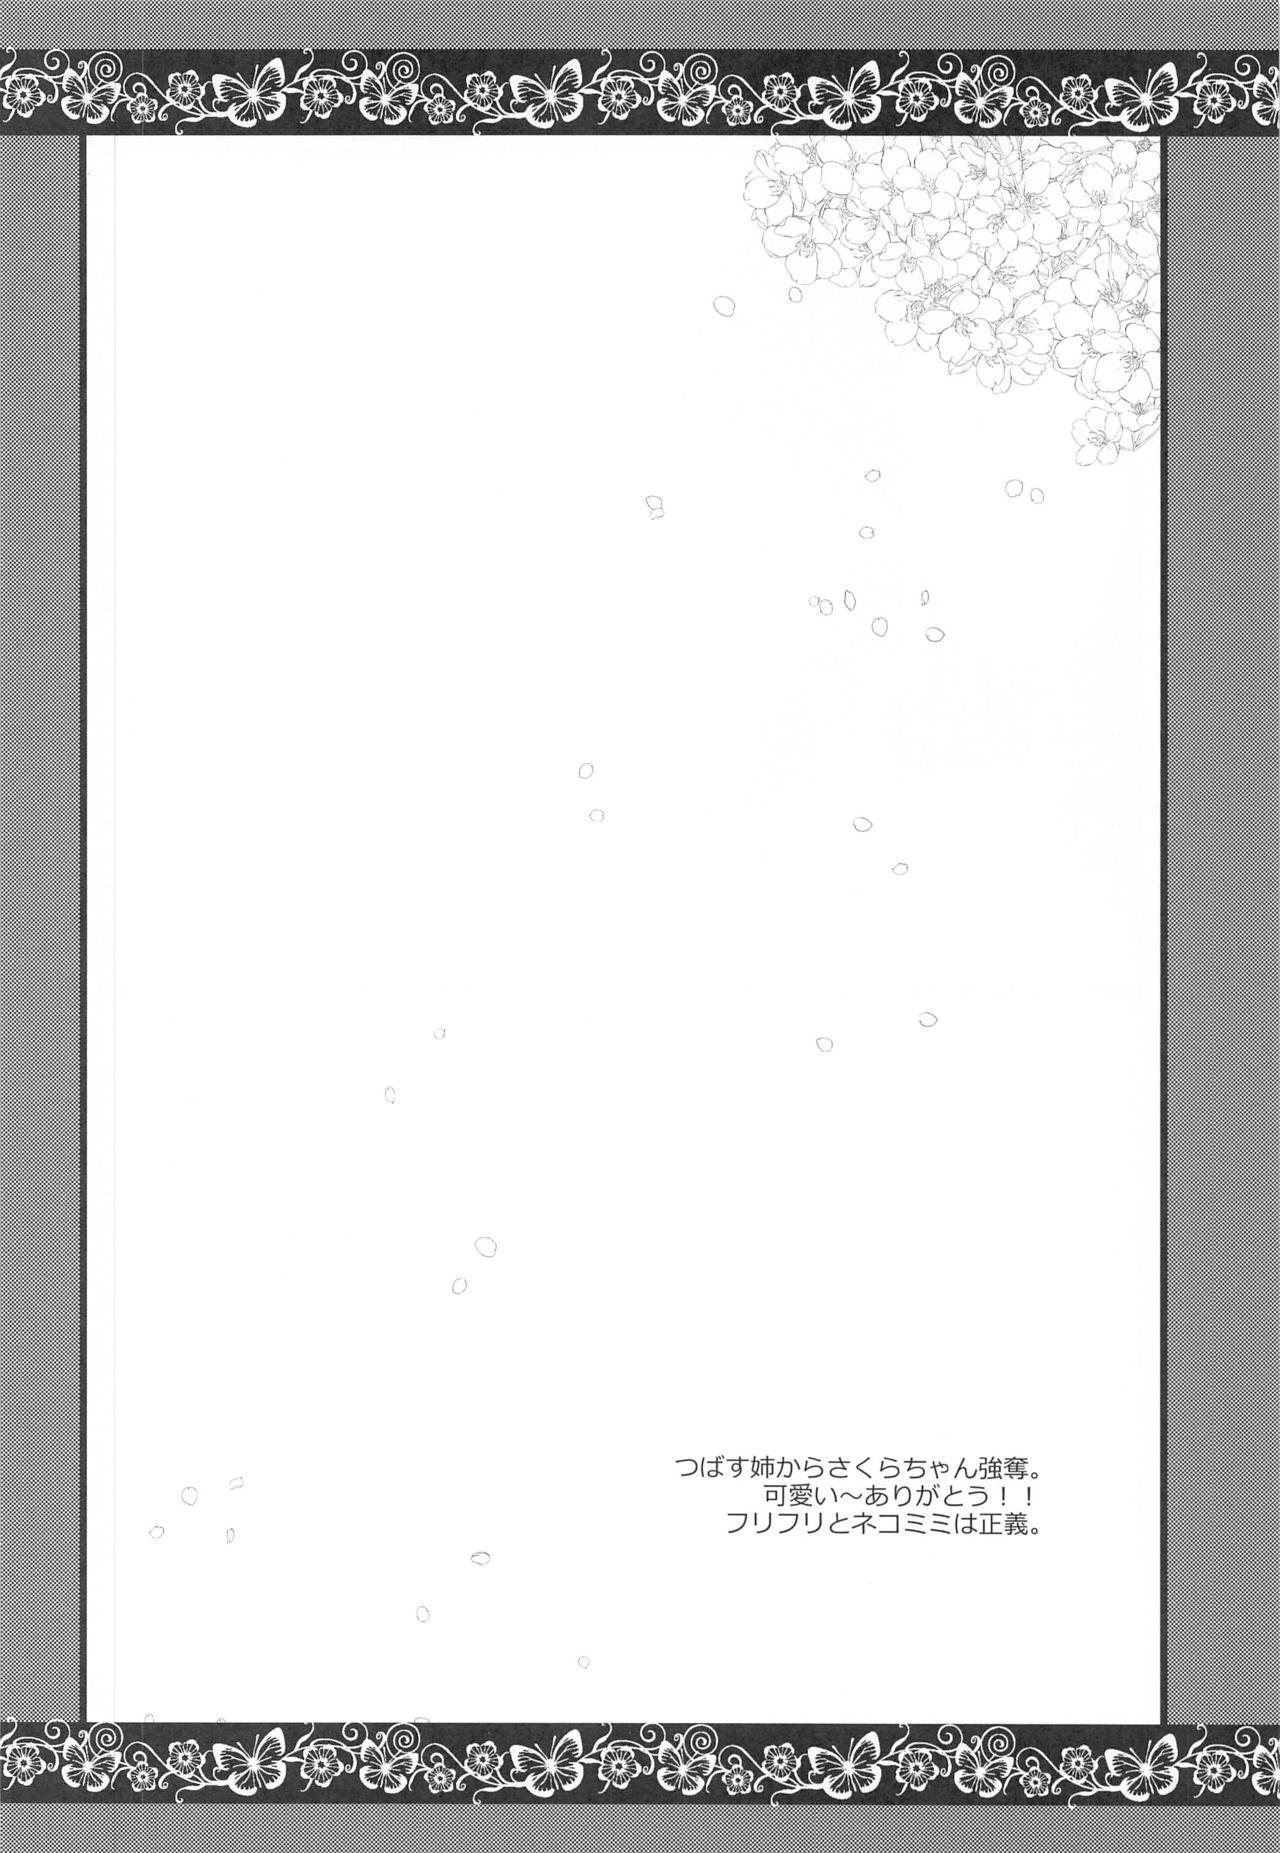 Maid to Goshujin-sama 24